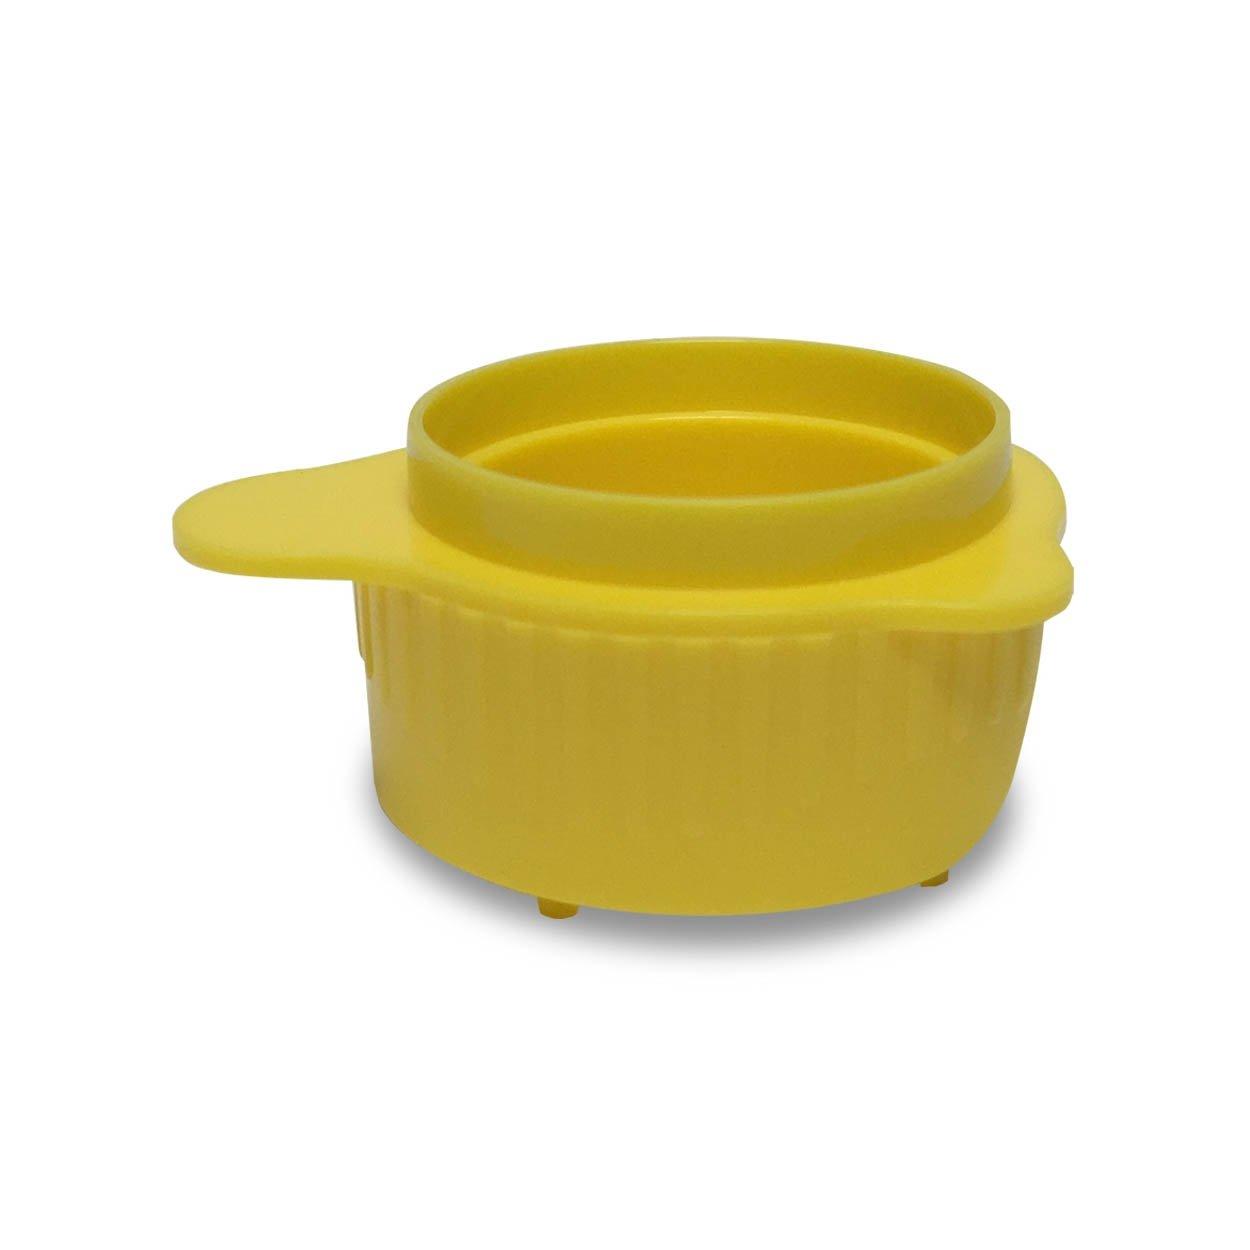 SureStrain 100um Premium Cell Strainer - Yellow (600 Strainers & 12 Reducing Adapters/Case)